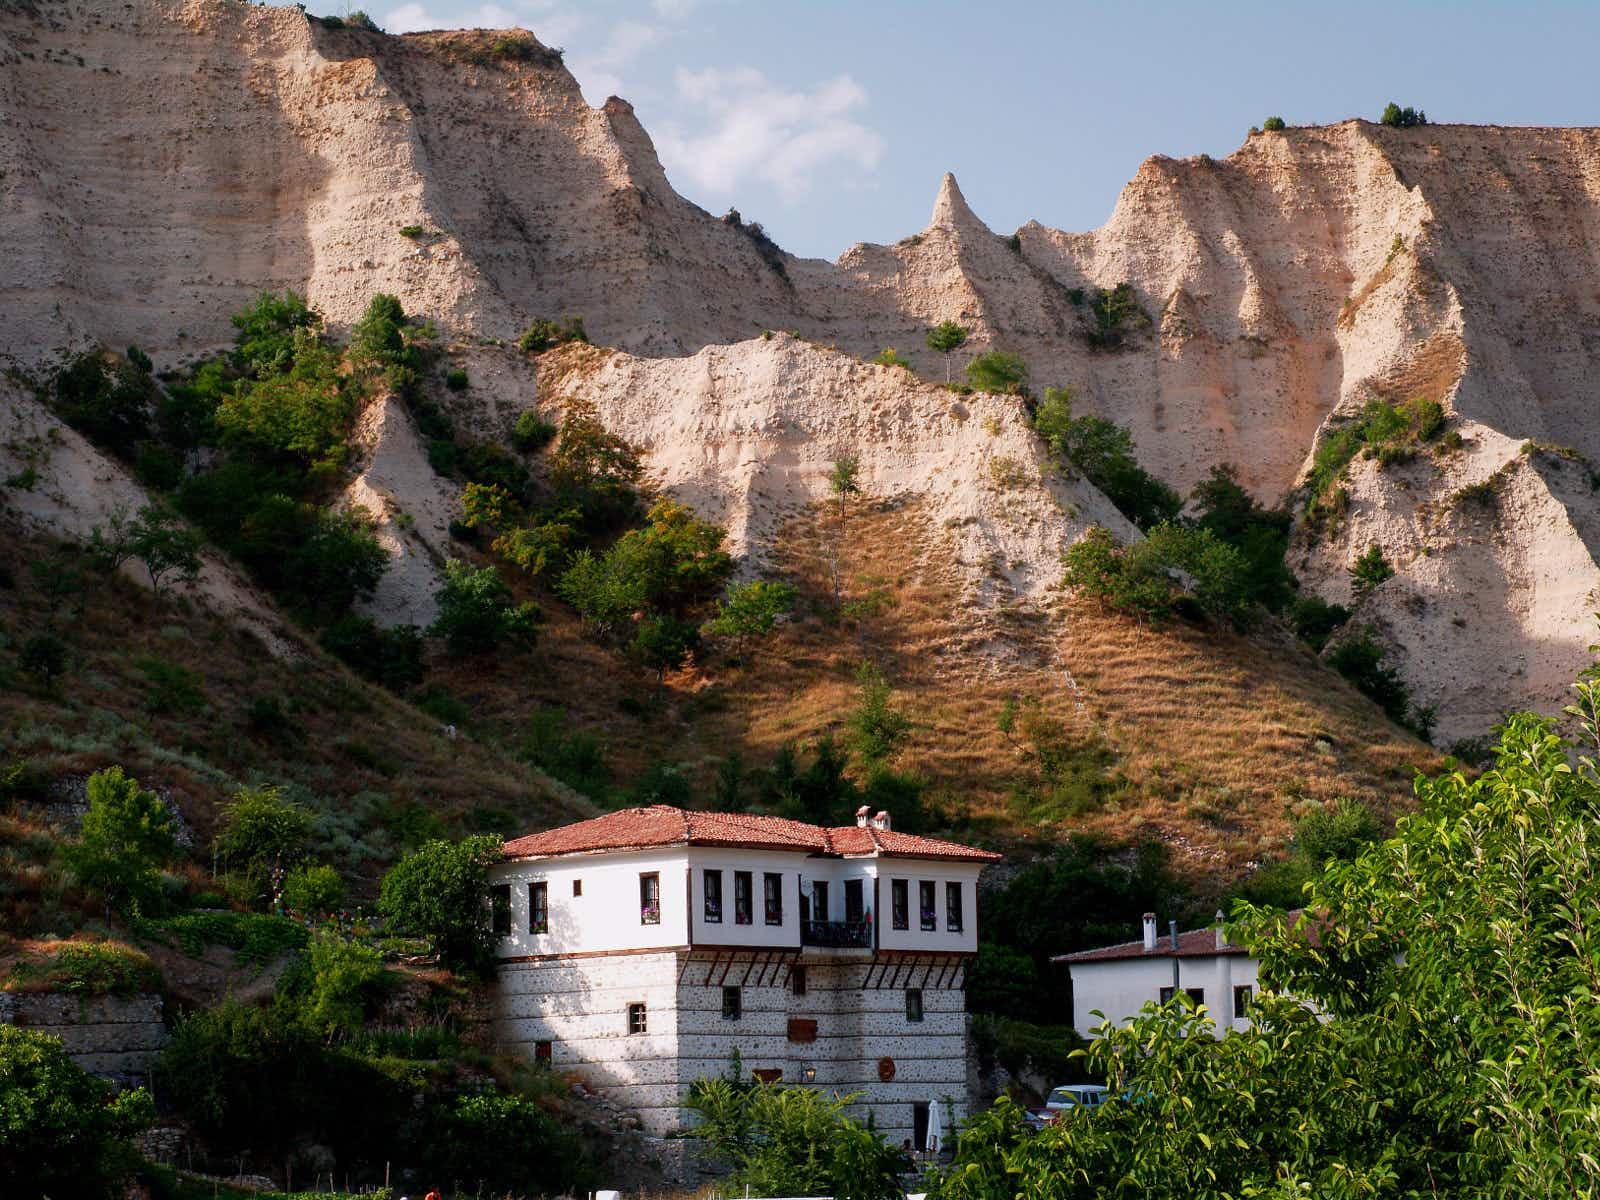 Bulgaria rocks: a hiker's guide to five geological wonders